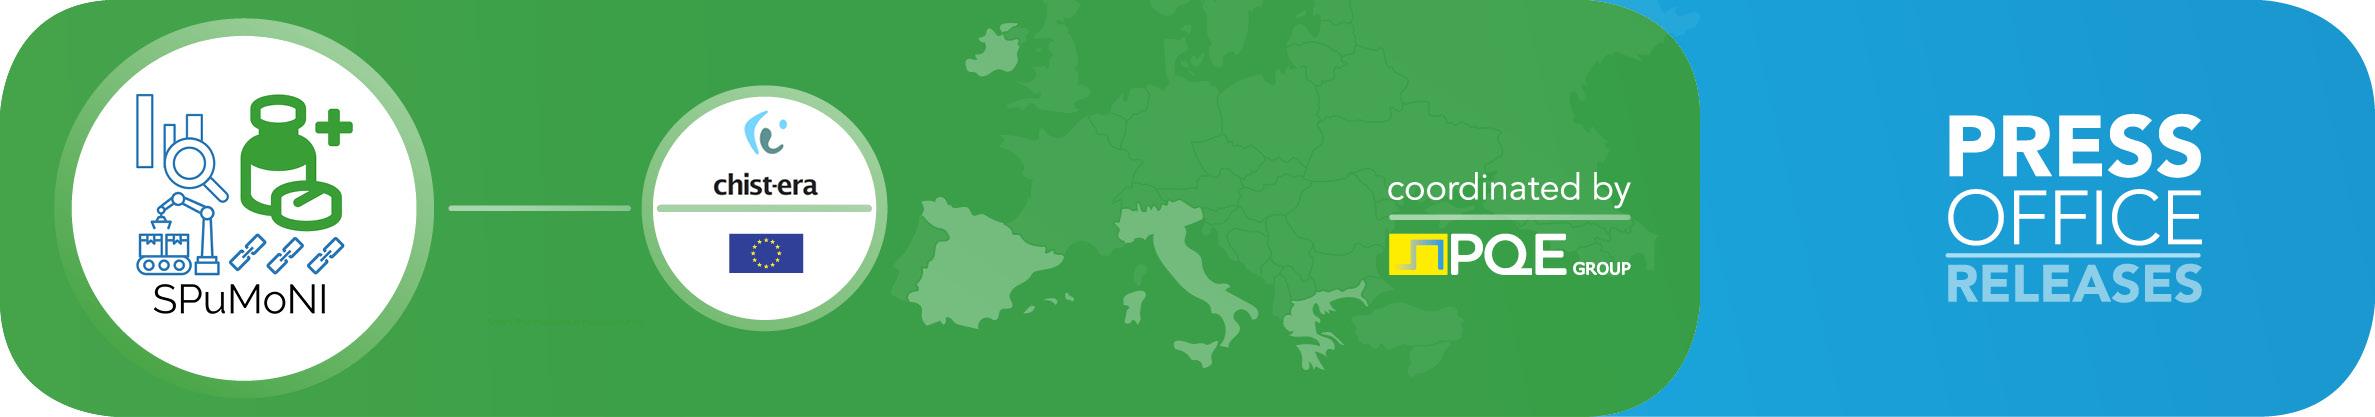 press realase Spumoni Consortium - PQE Group - Fareva - University of Thessaly - National College Ireland - Polytechnic Valencia